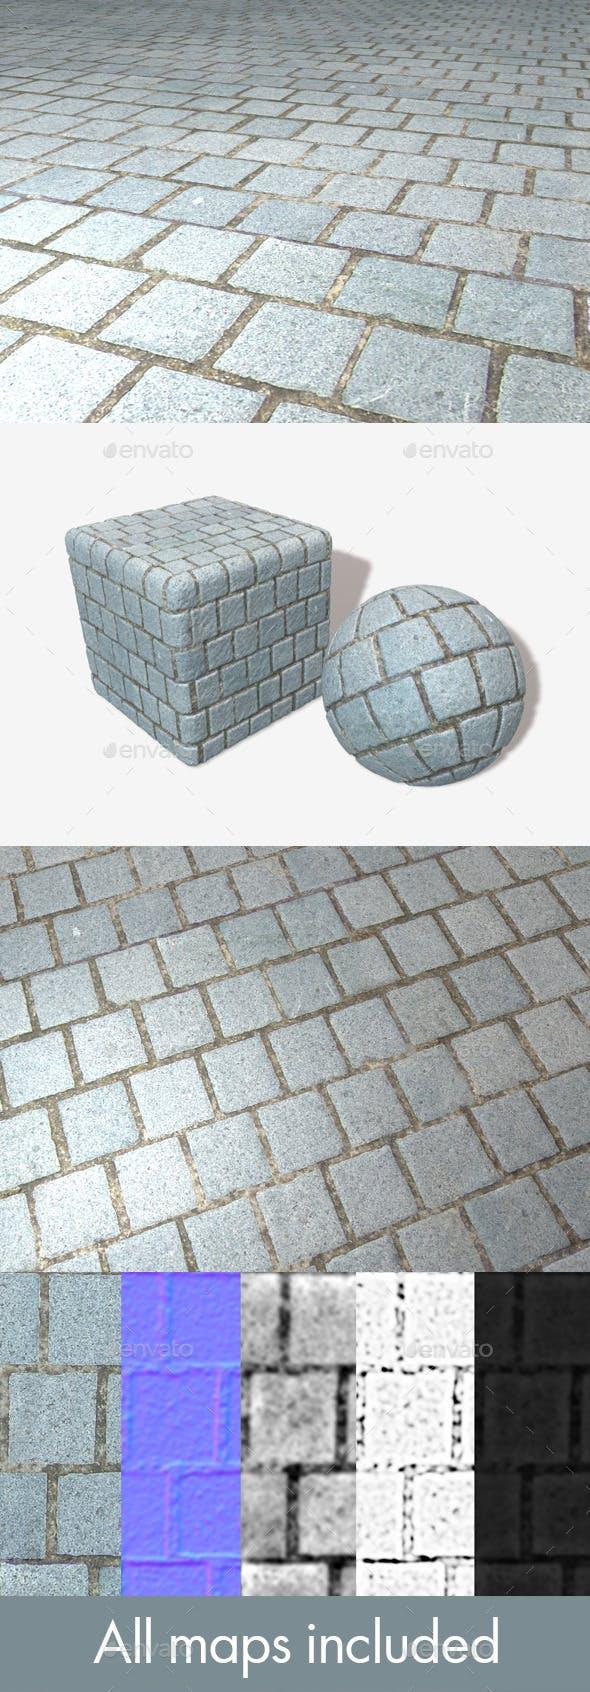 Grey Ground Bricks Seamless Texture - 3DOcean Item for Sale